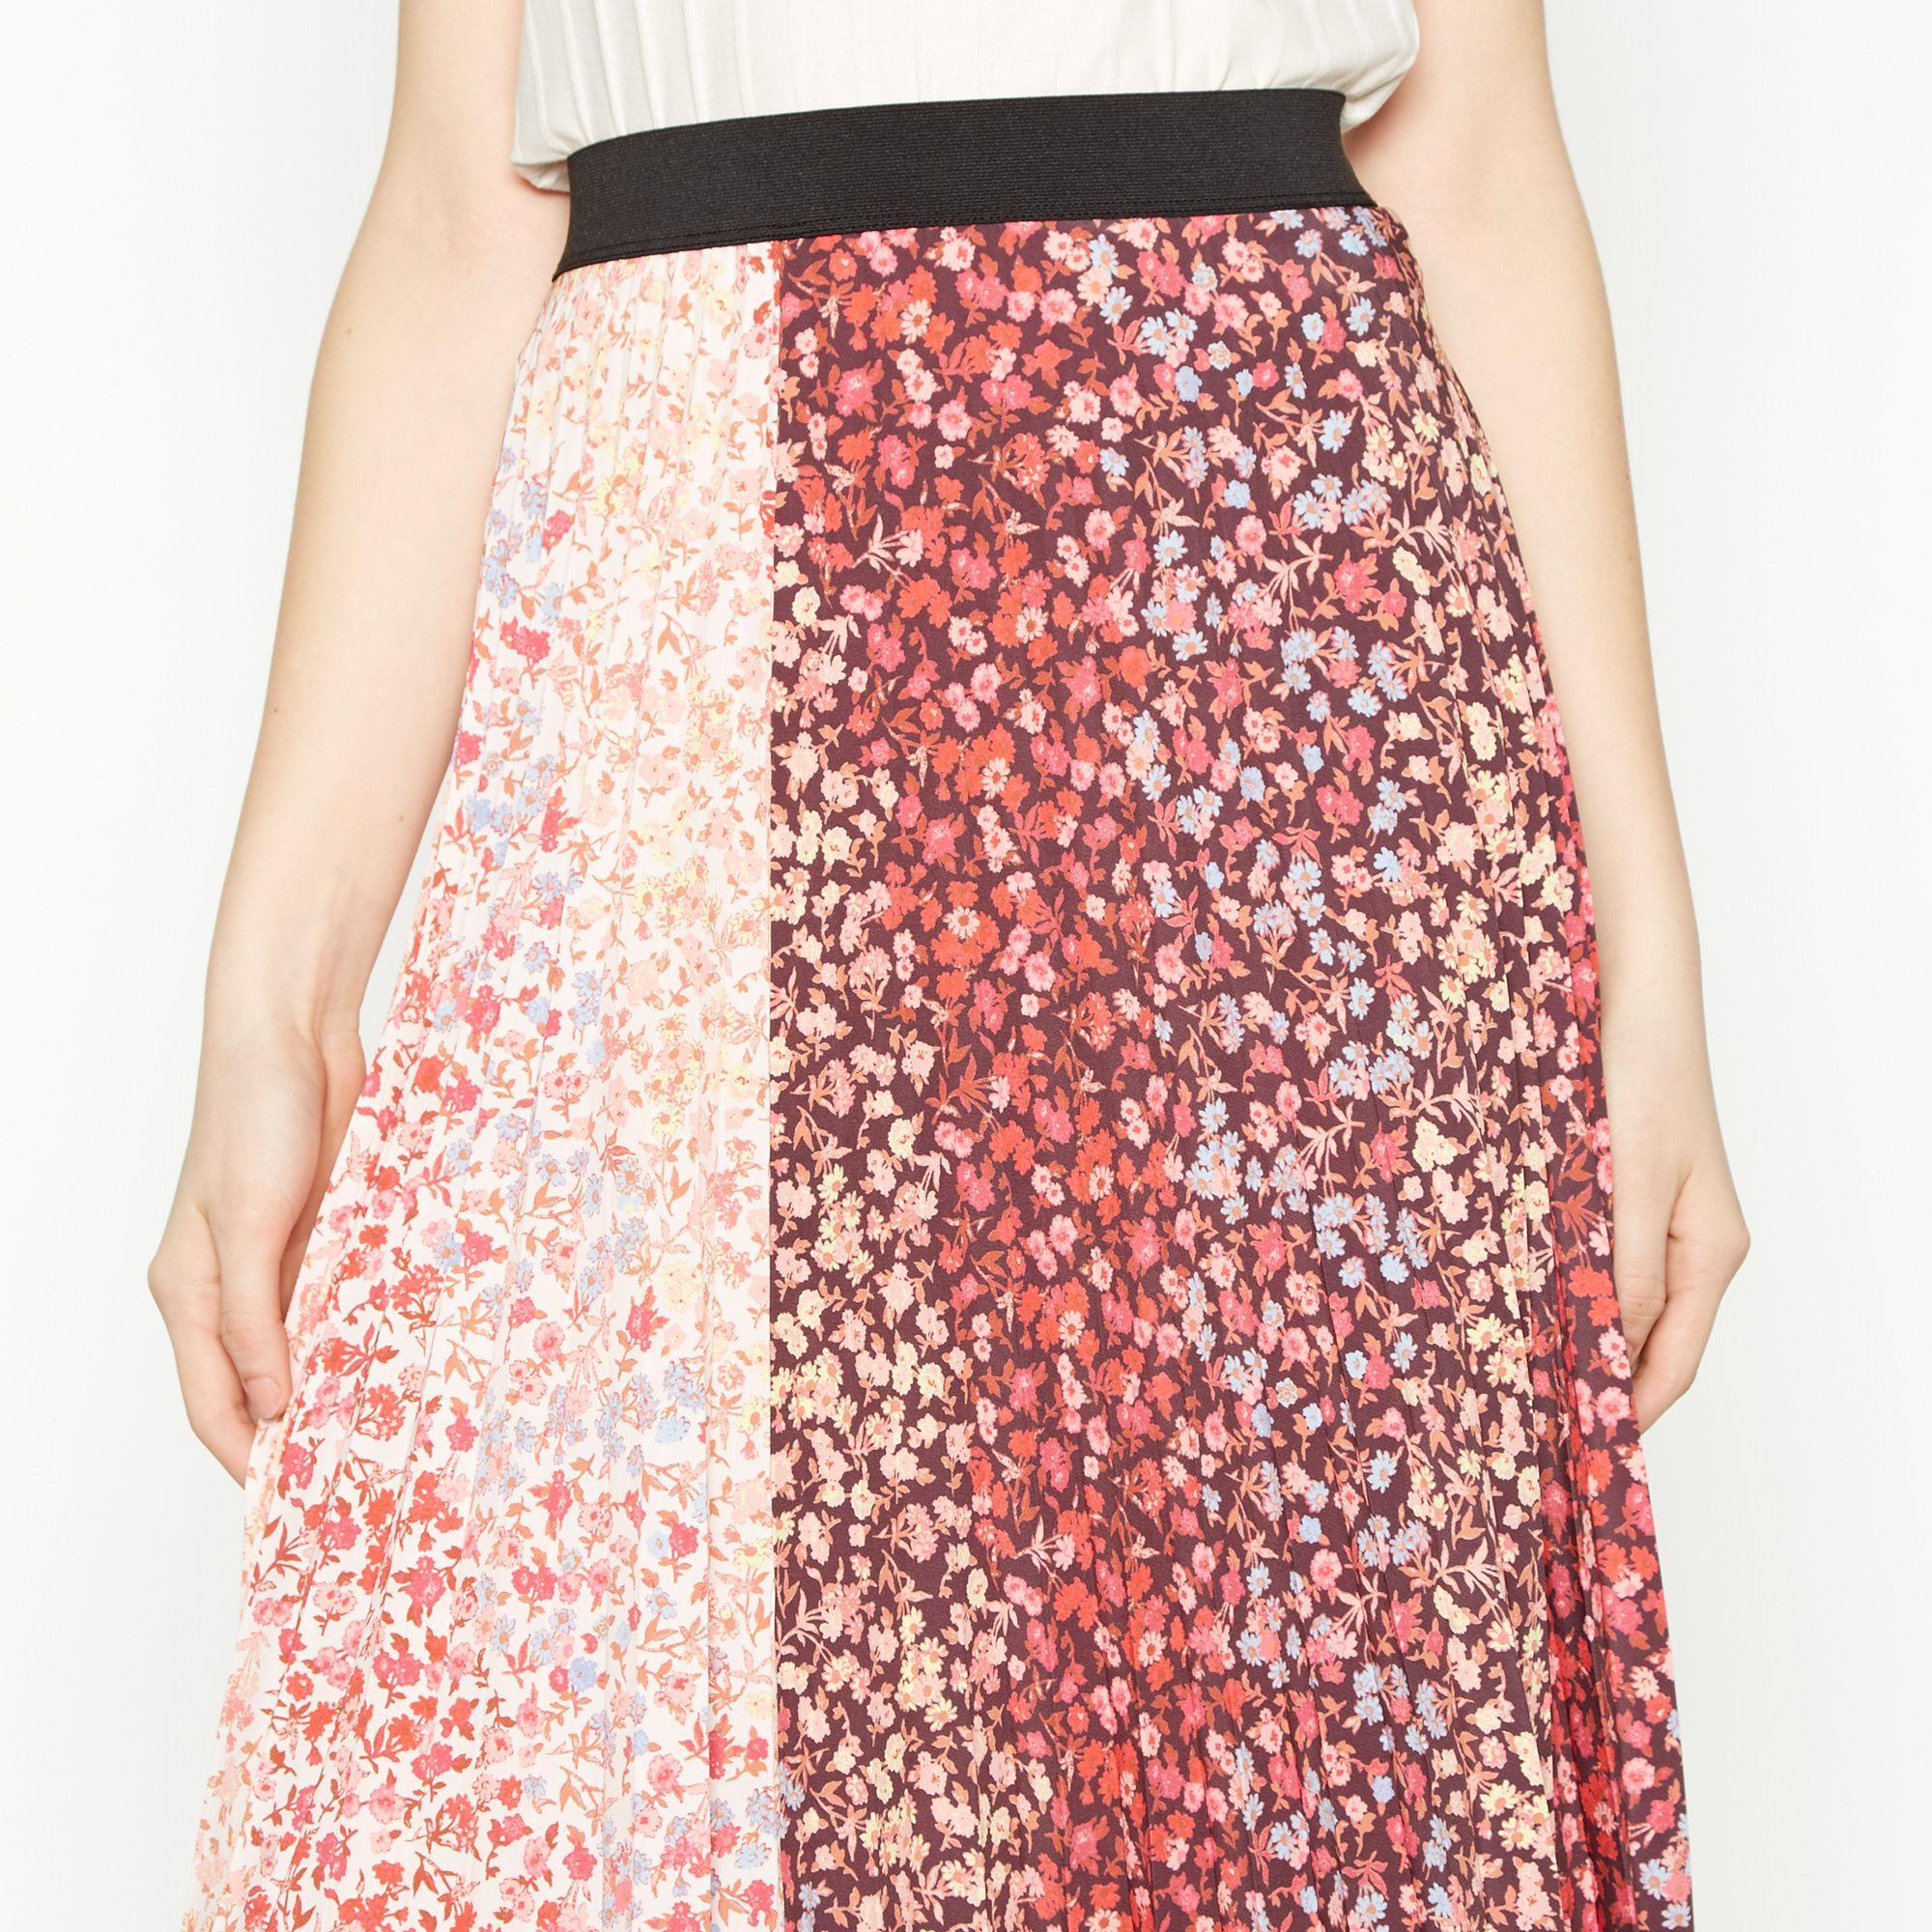 e1a4ed7c6 Red Herring - Multicoloured Floral Print Pleated Midi Skirt - Lyst. View  fullscreen